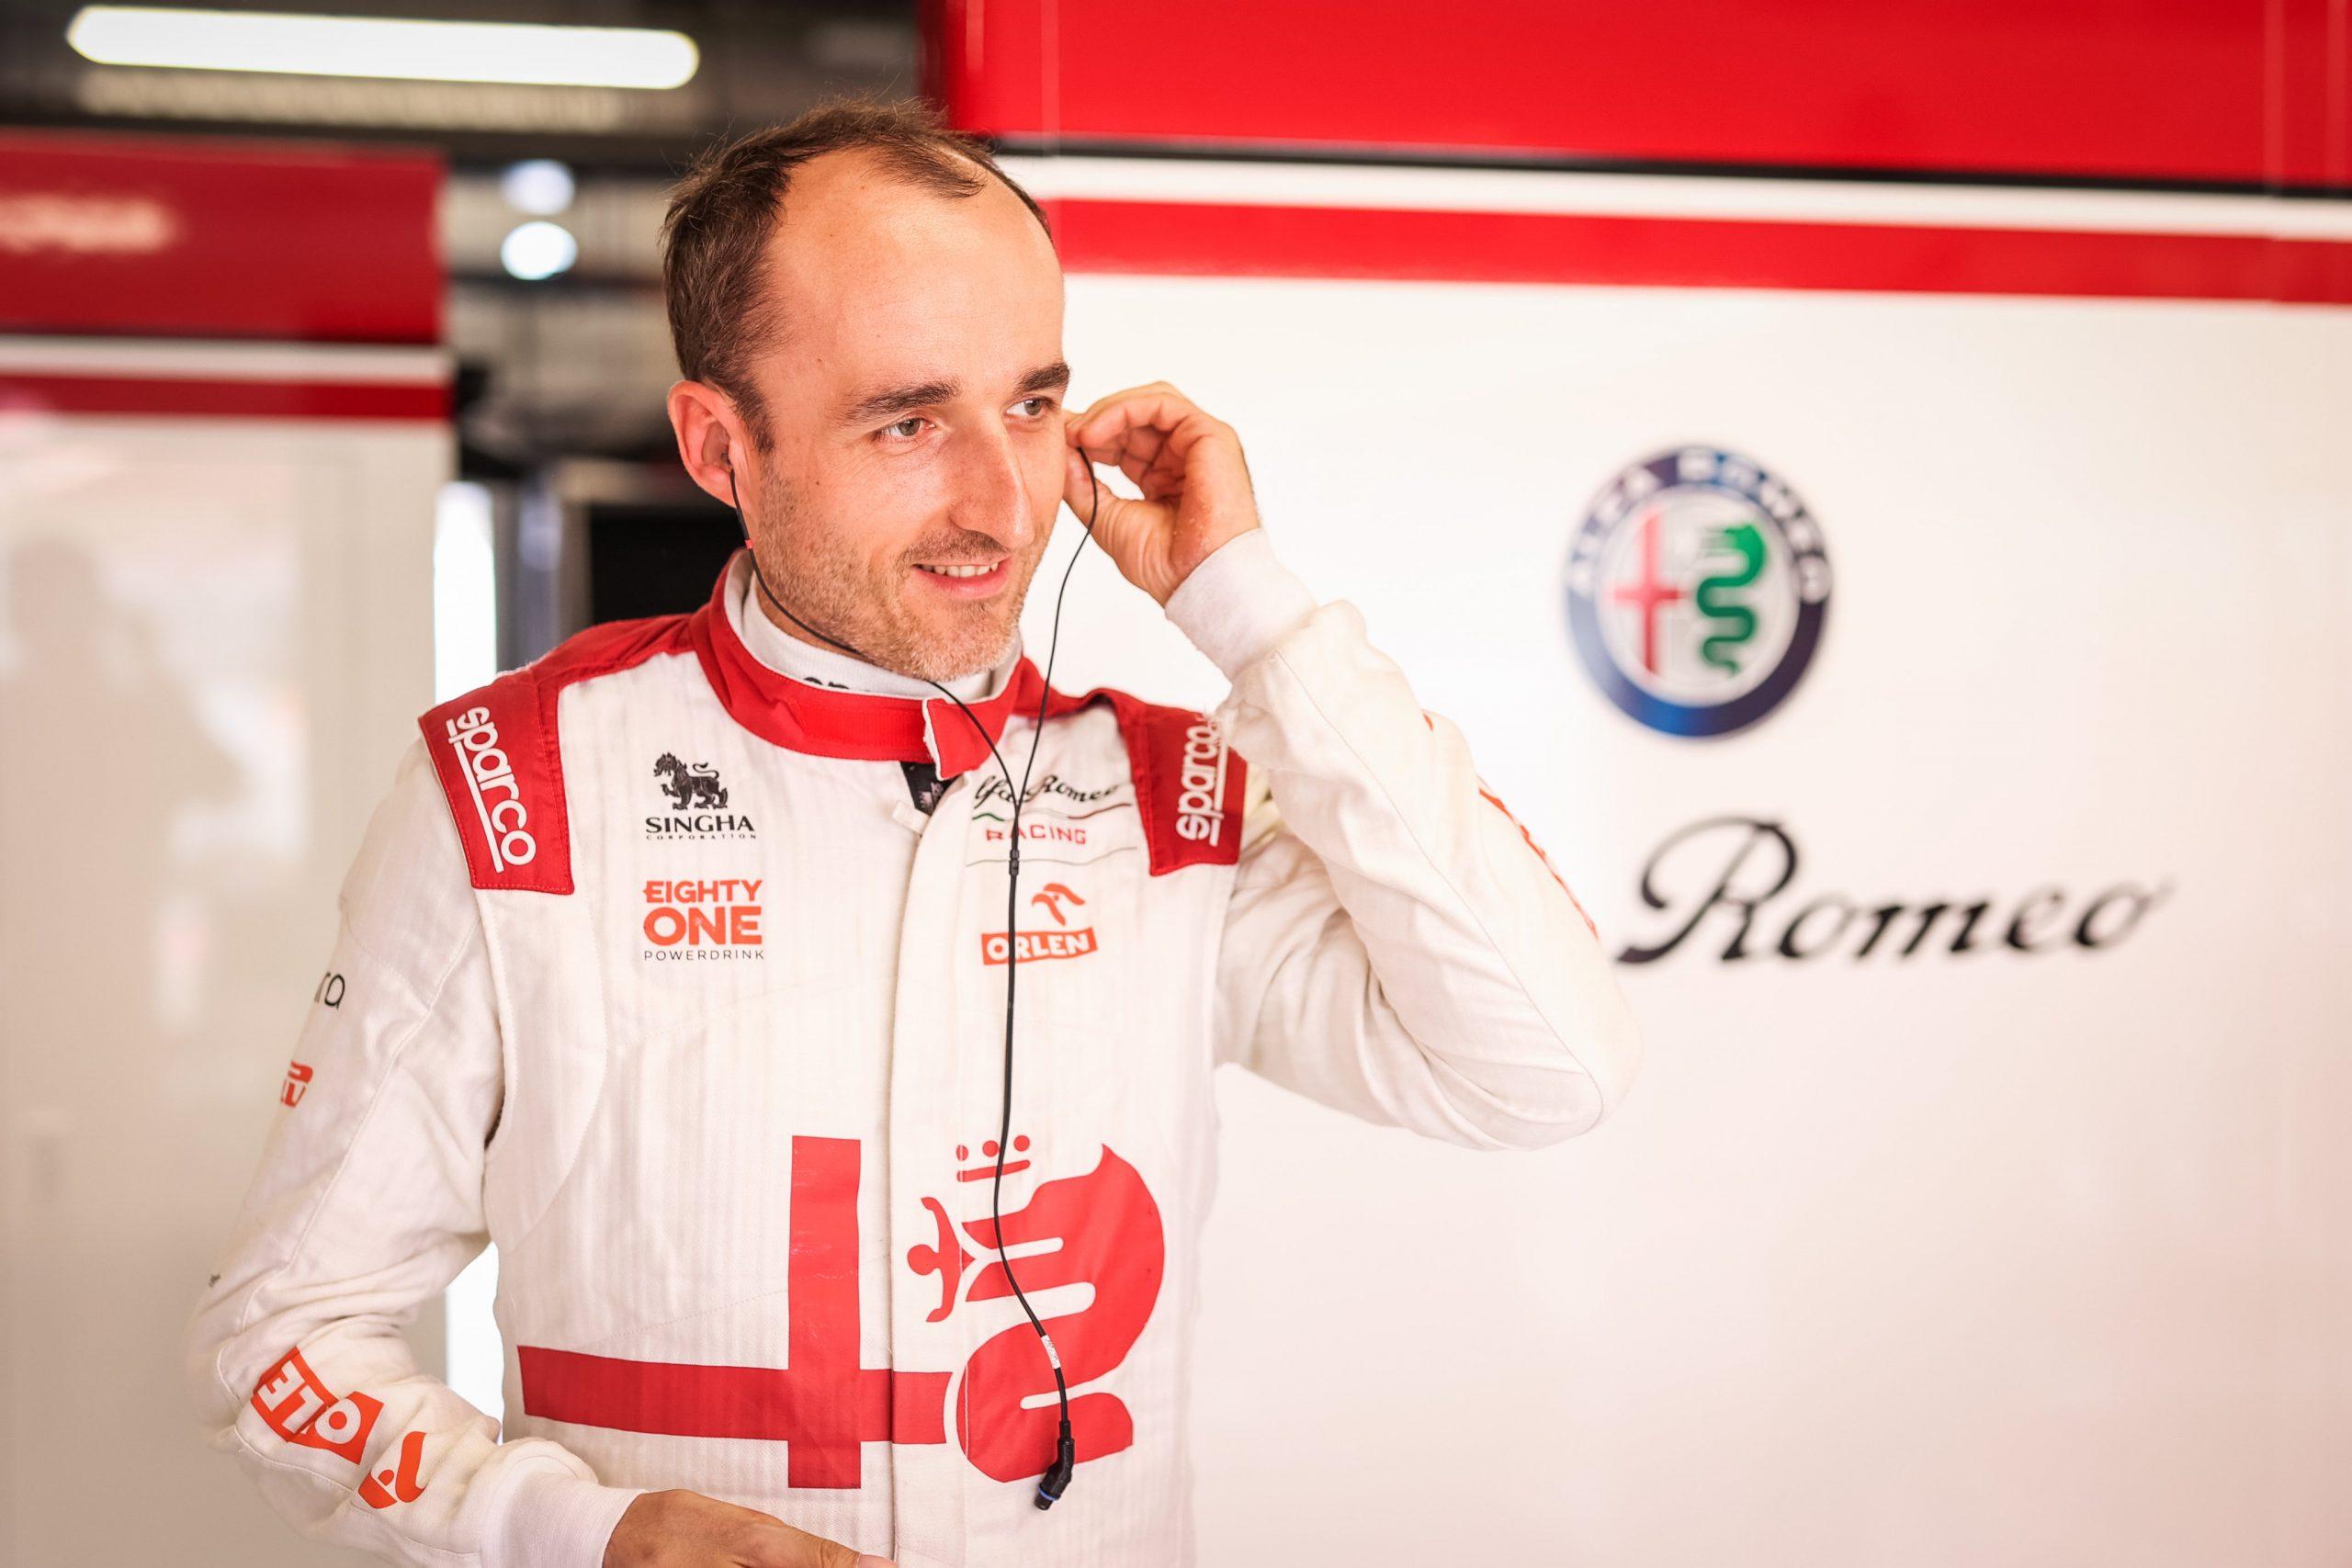 Robert Kubica sostituirà Kimi Raikkonen al Gp d'Olanda.